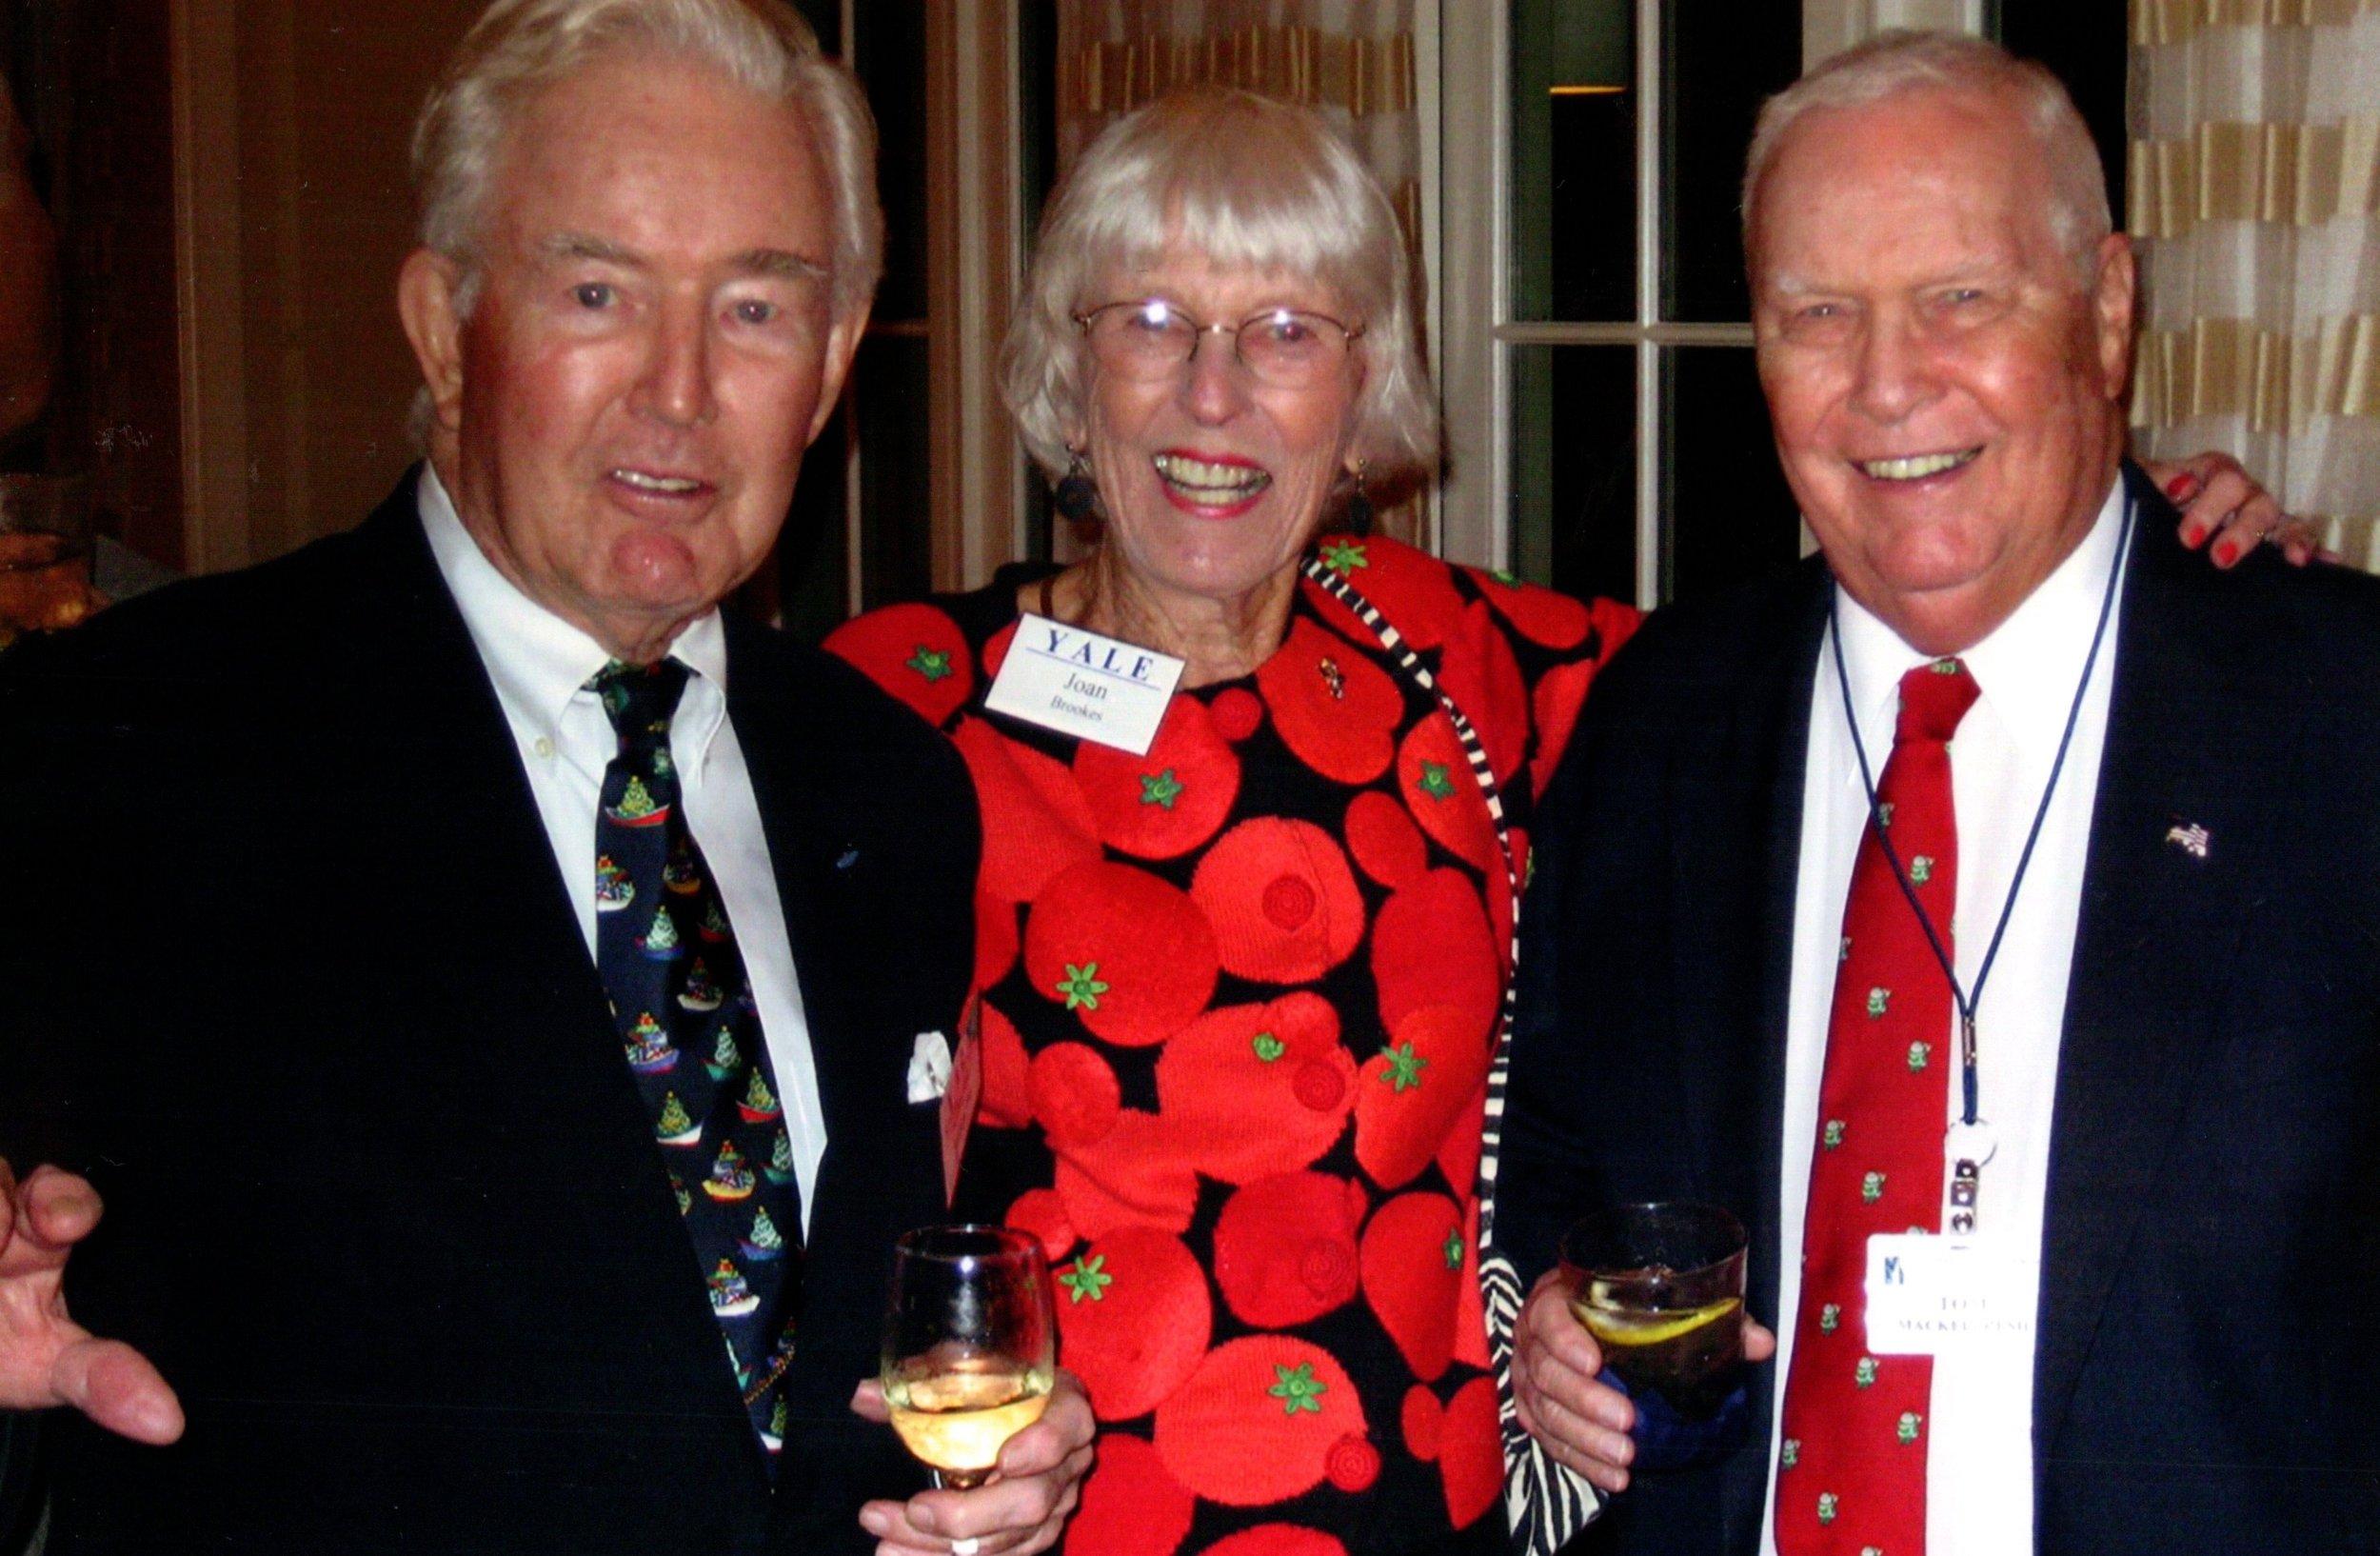 12_11_2008 - HOLIDAY PARTY - TOM WHEELER'S HOME 17.jpg